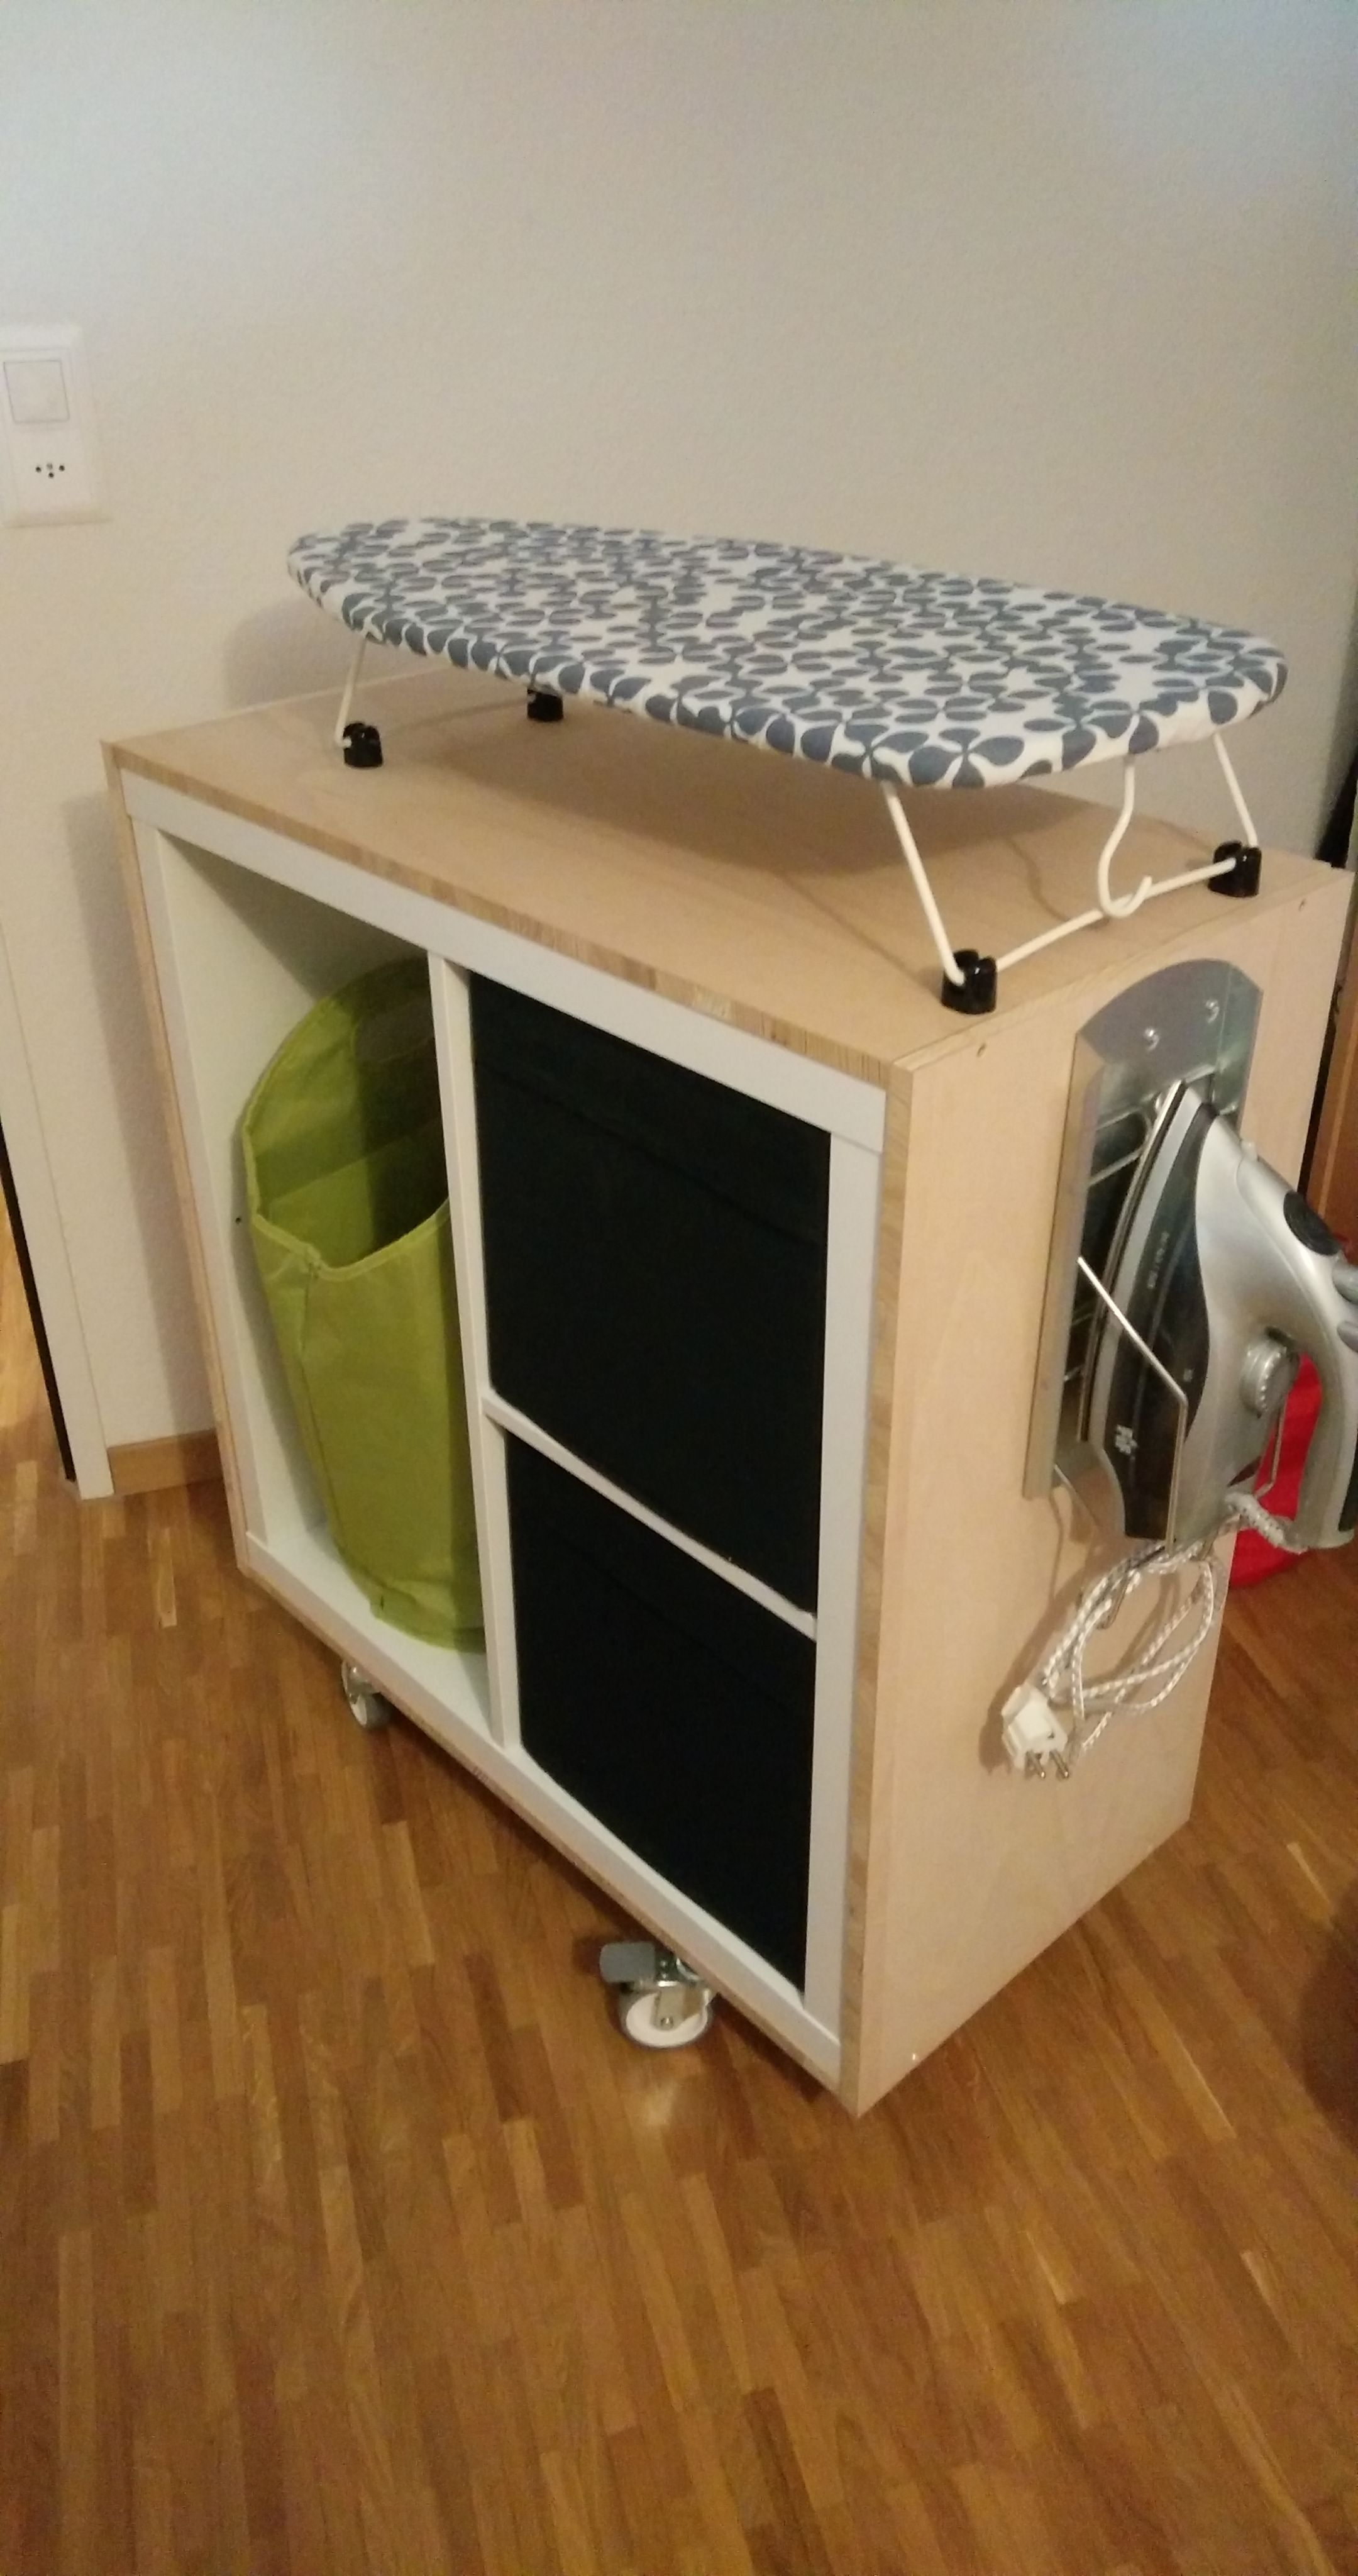 ikea hack iron station by kallax new house ideas in 2019 ikea hack ikea kallax. Black Bedroom Furniture Sets. Home Design Ideas